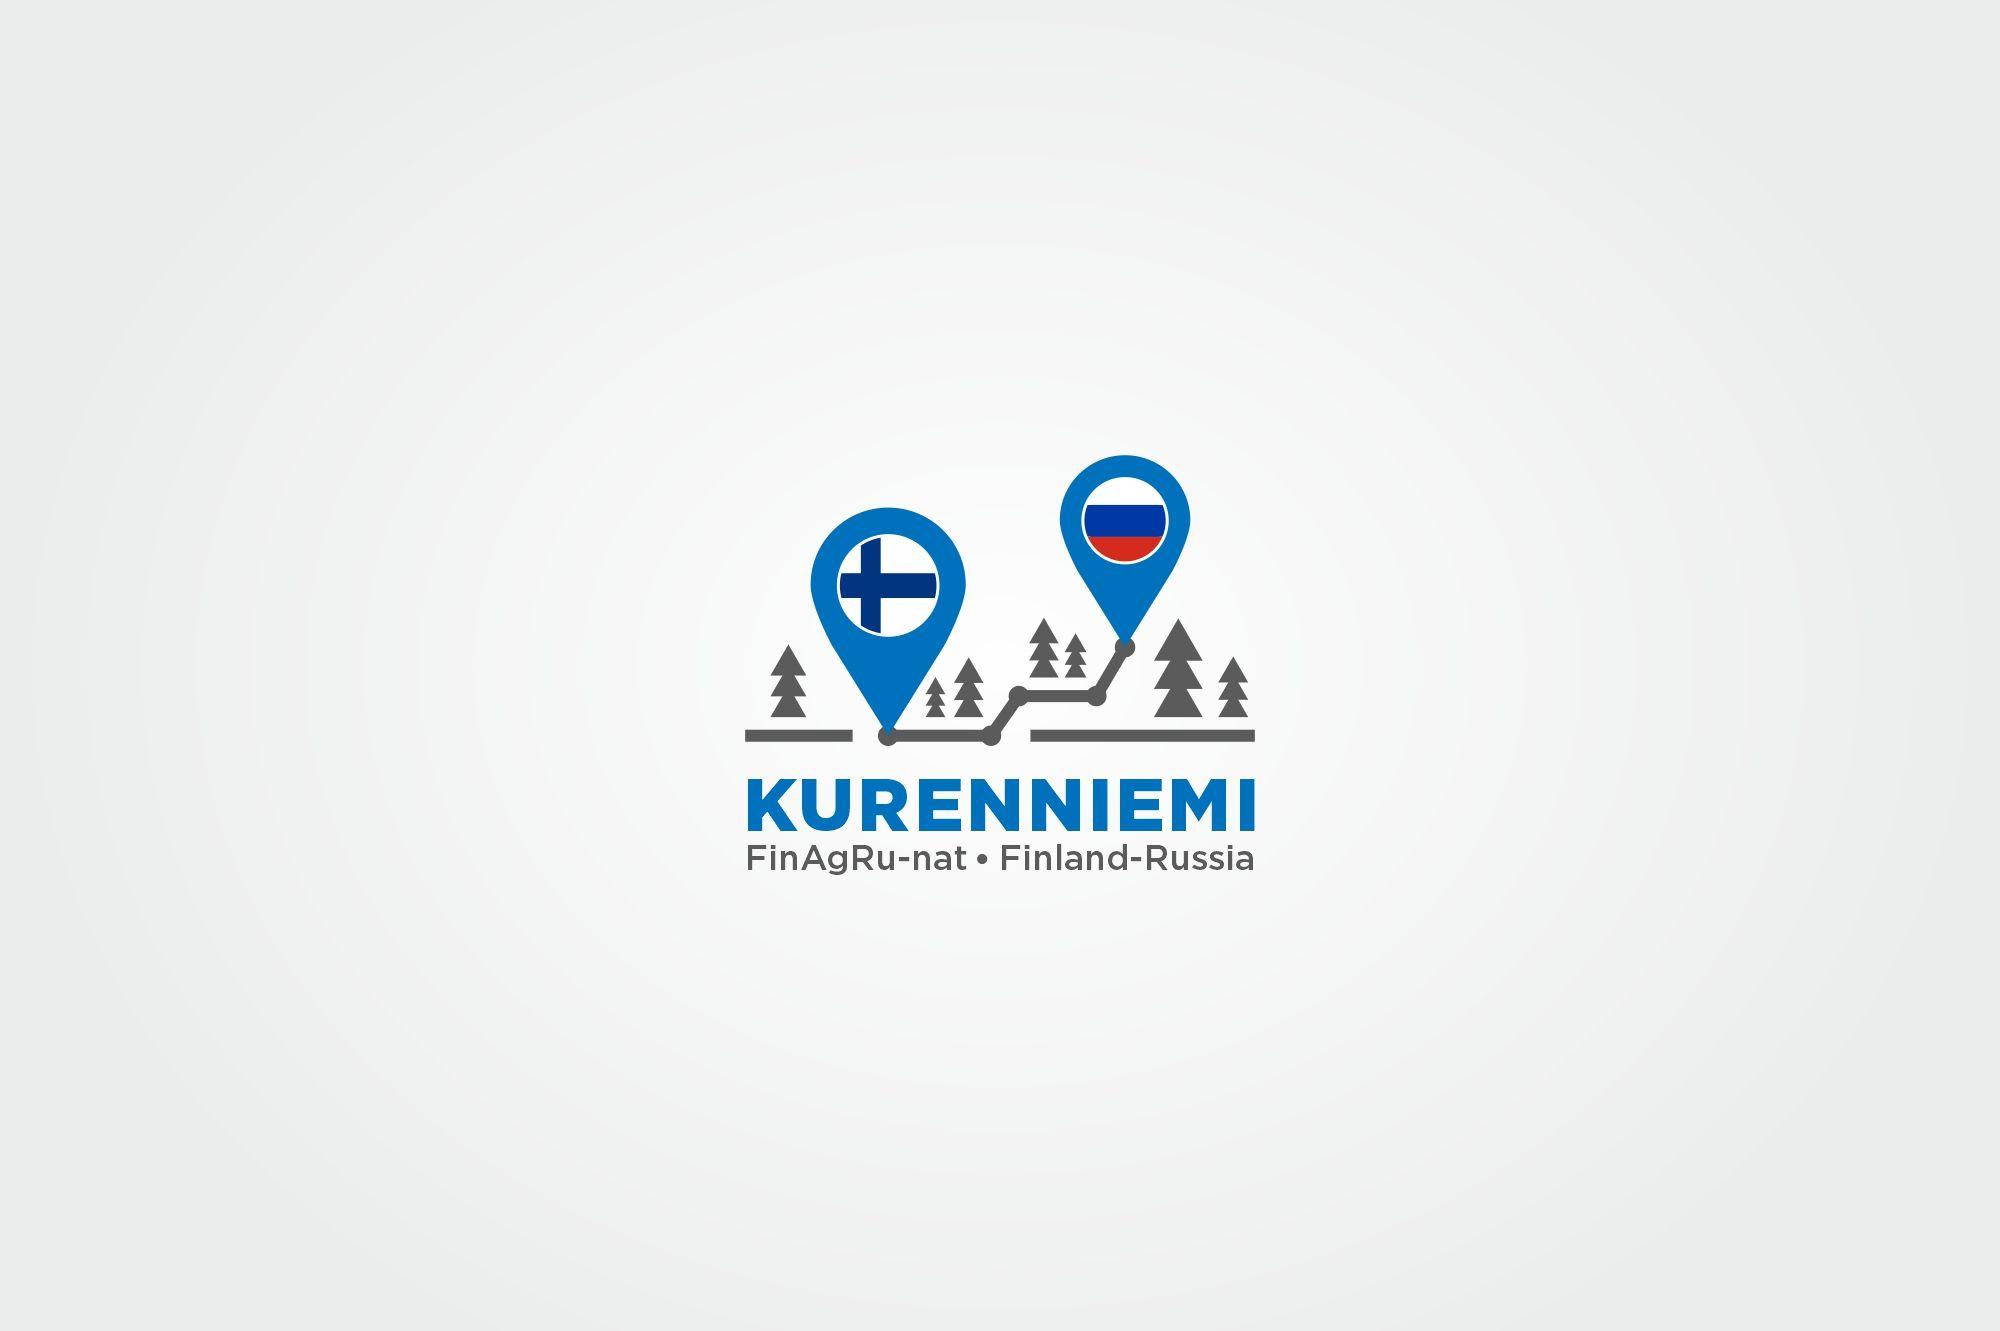 Логотип для Kurenniemi, FinAgRu-nat, Finland-Russia - дизайнер asketksm